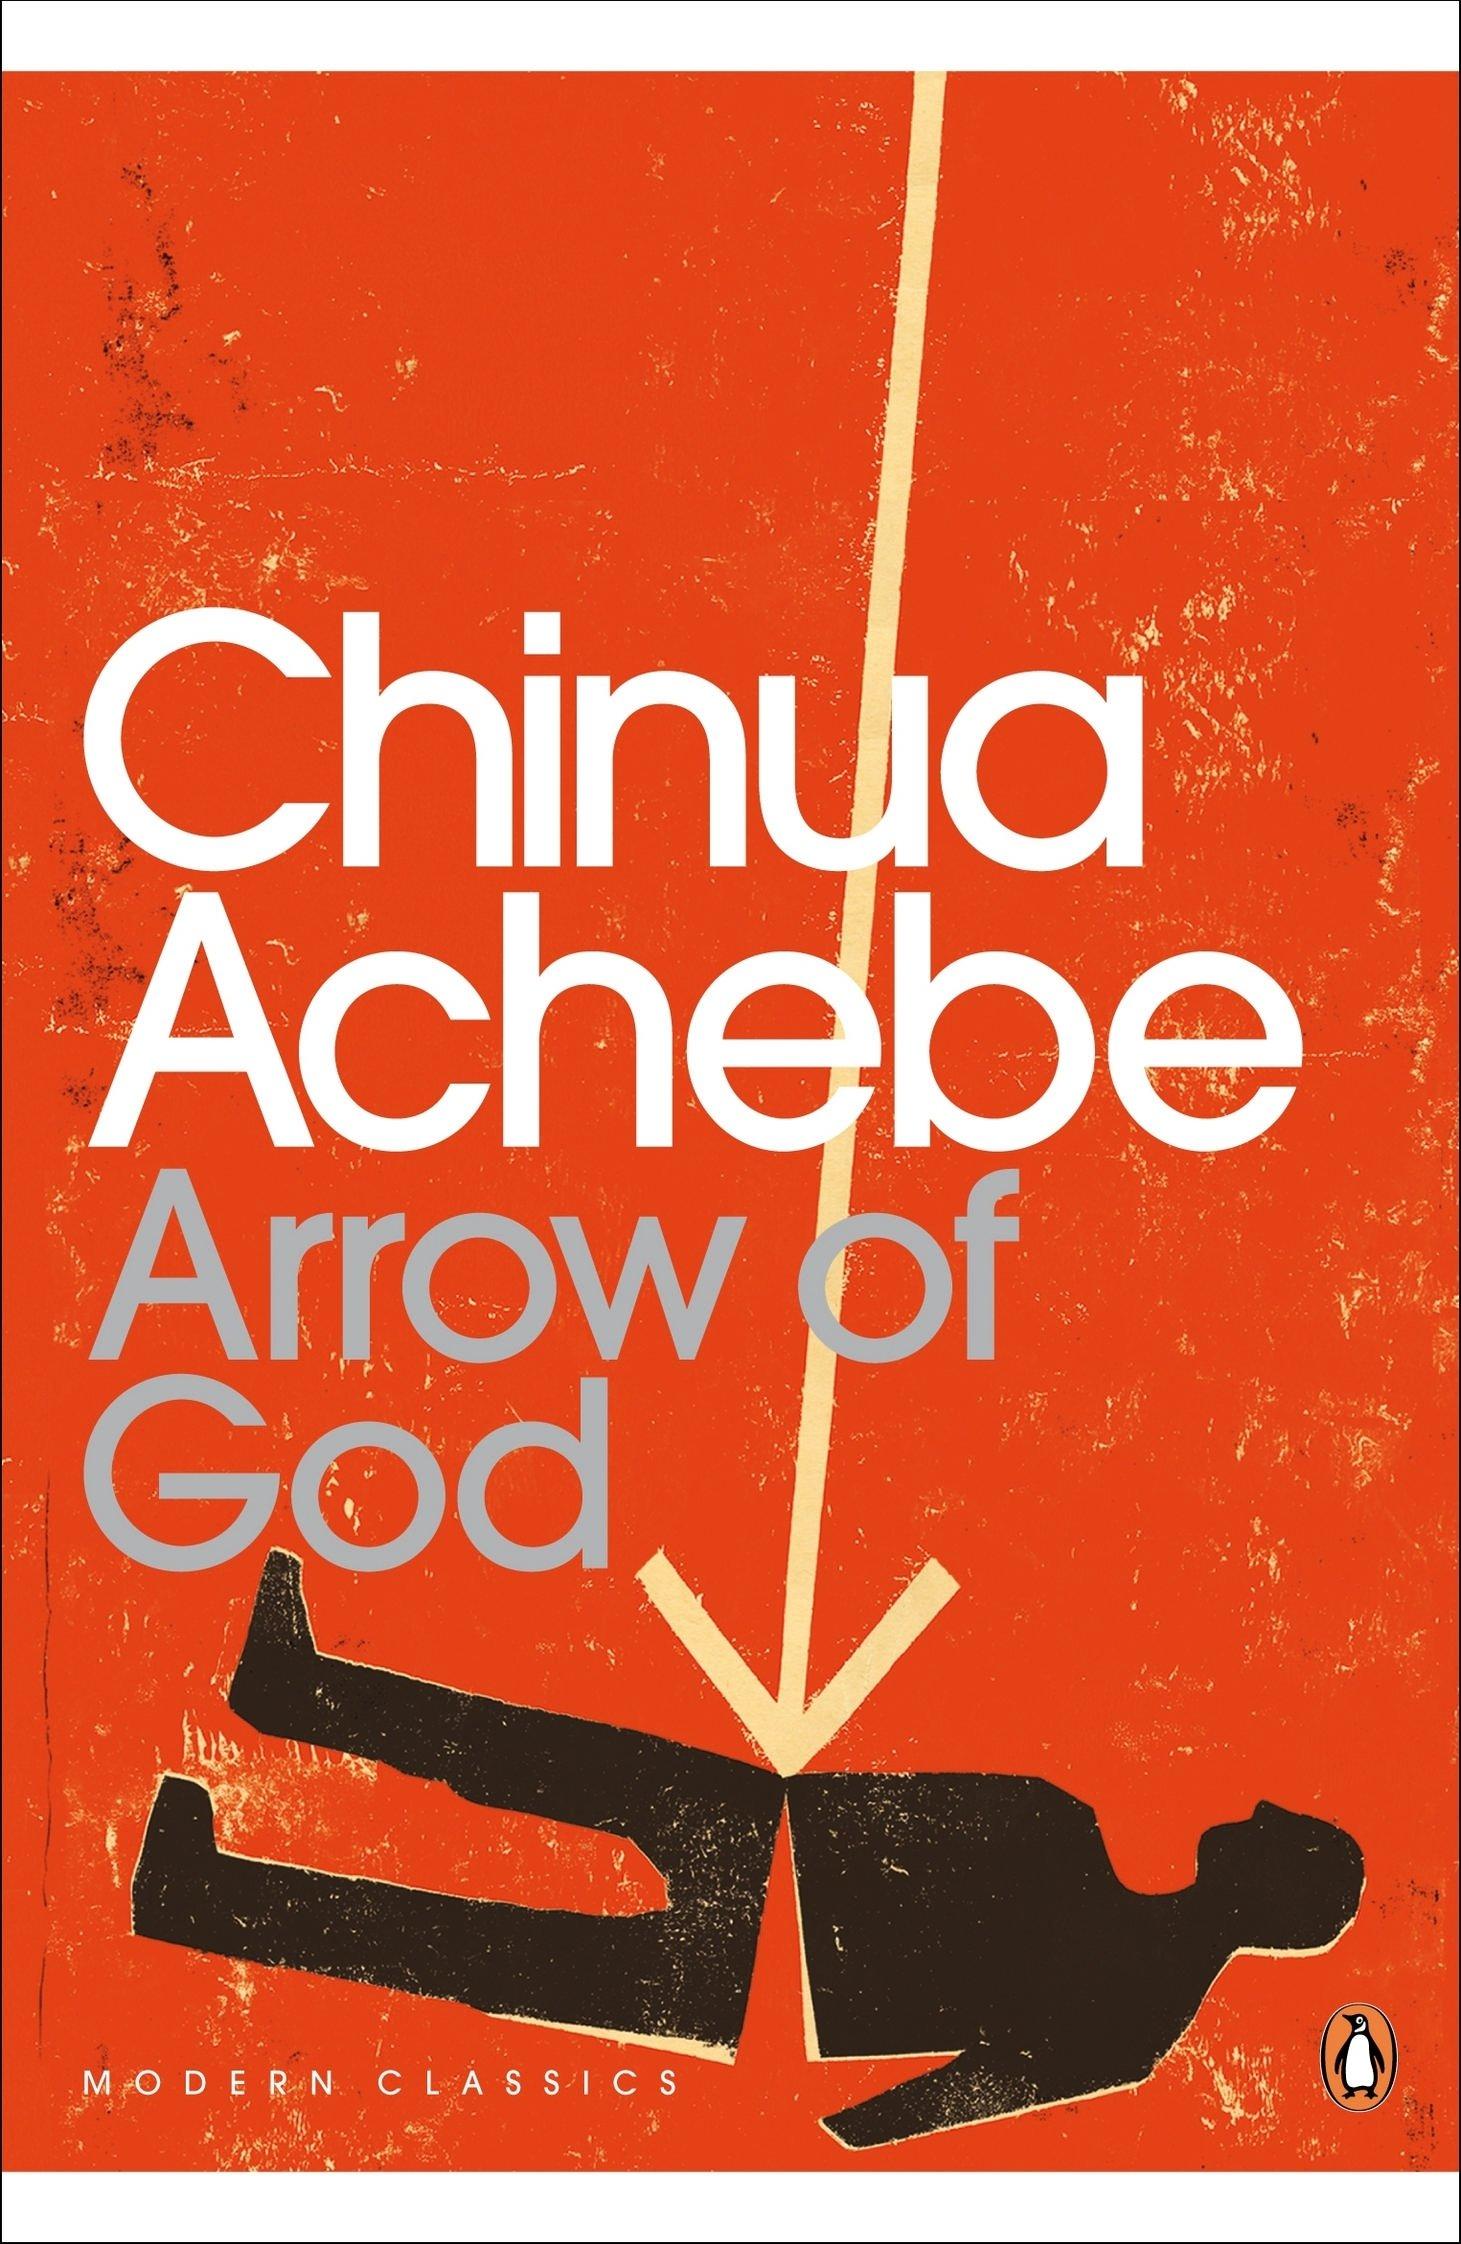 setting of arrow of god